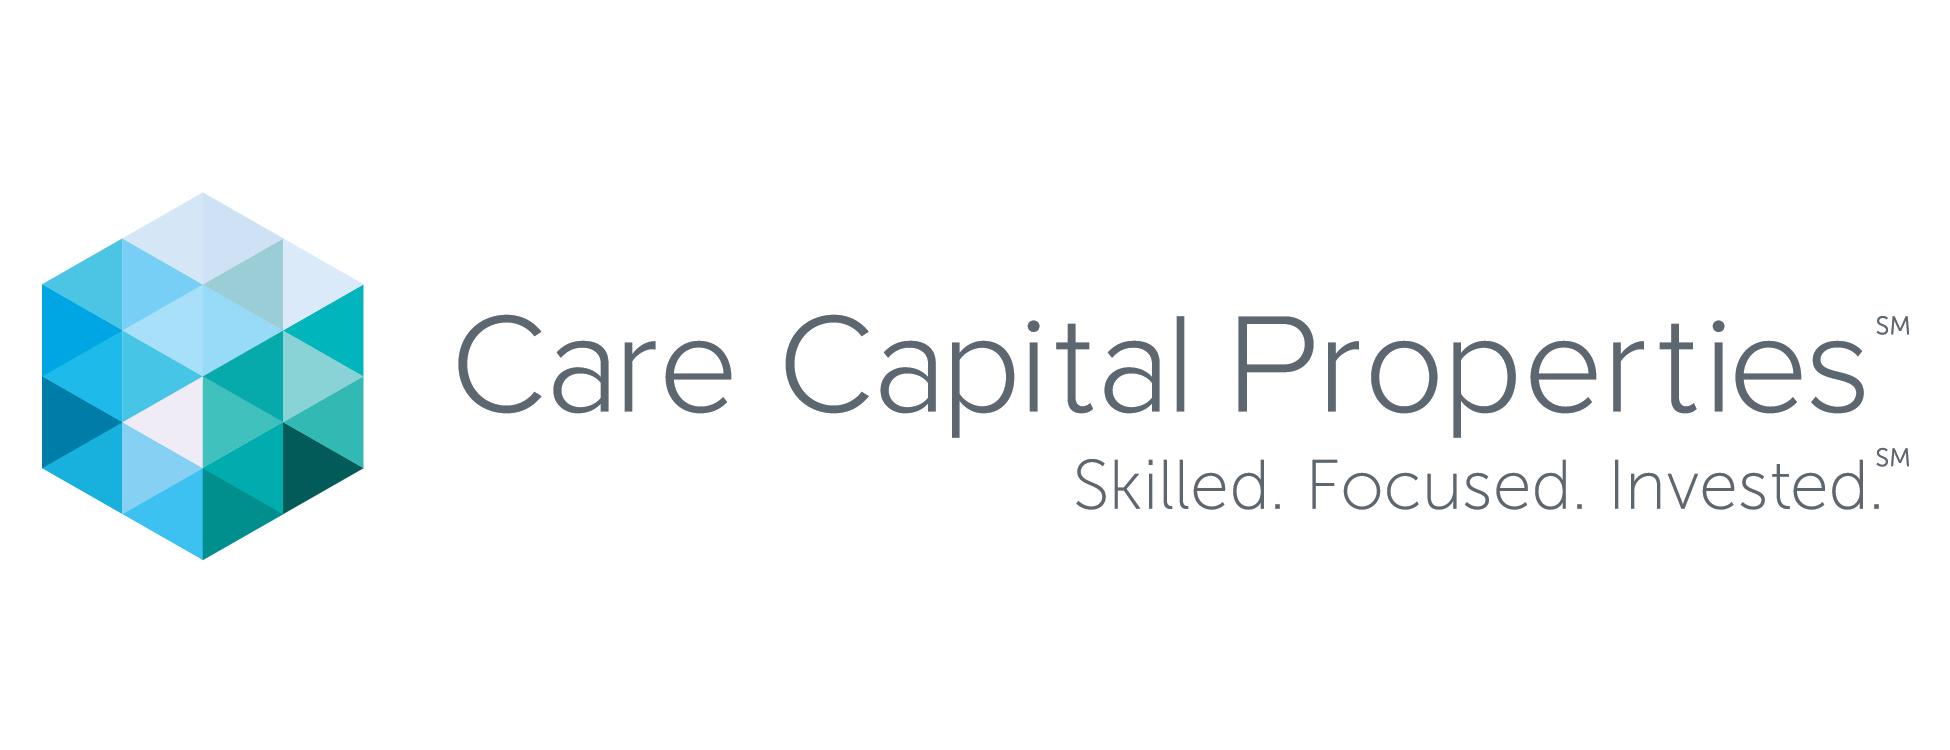 Capital Care Properties